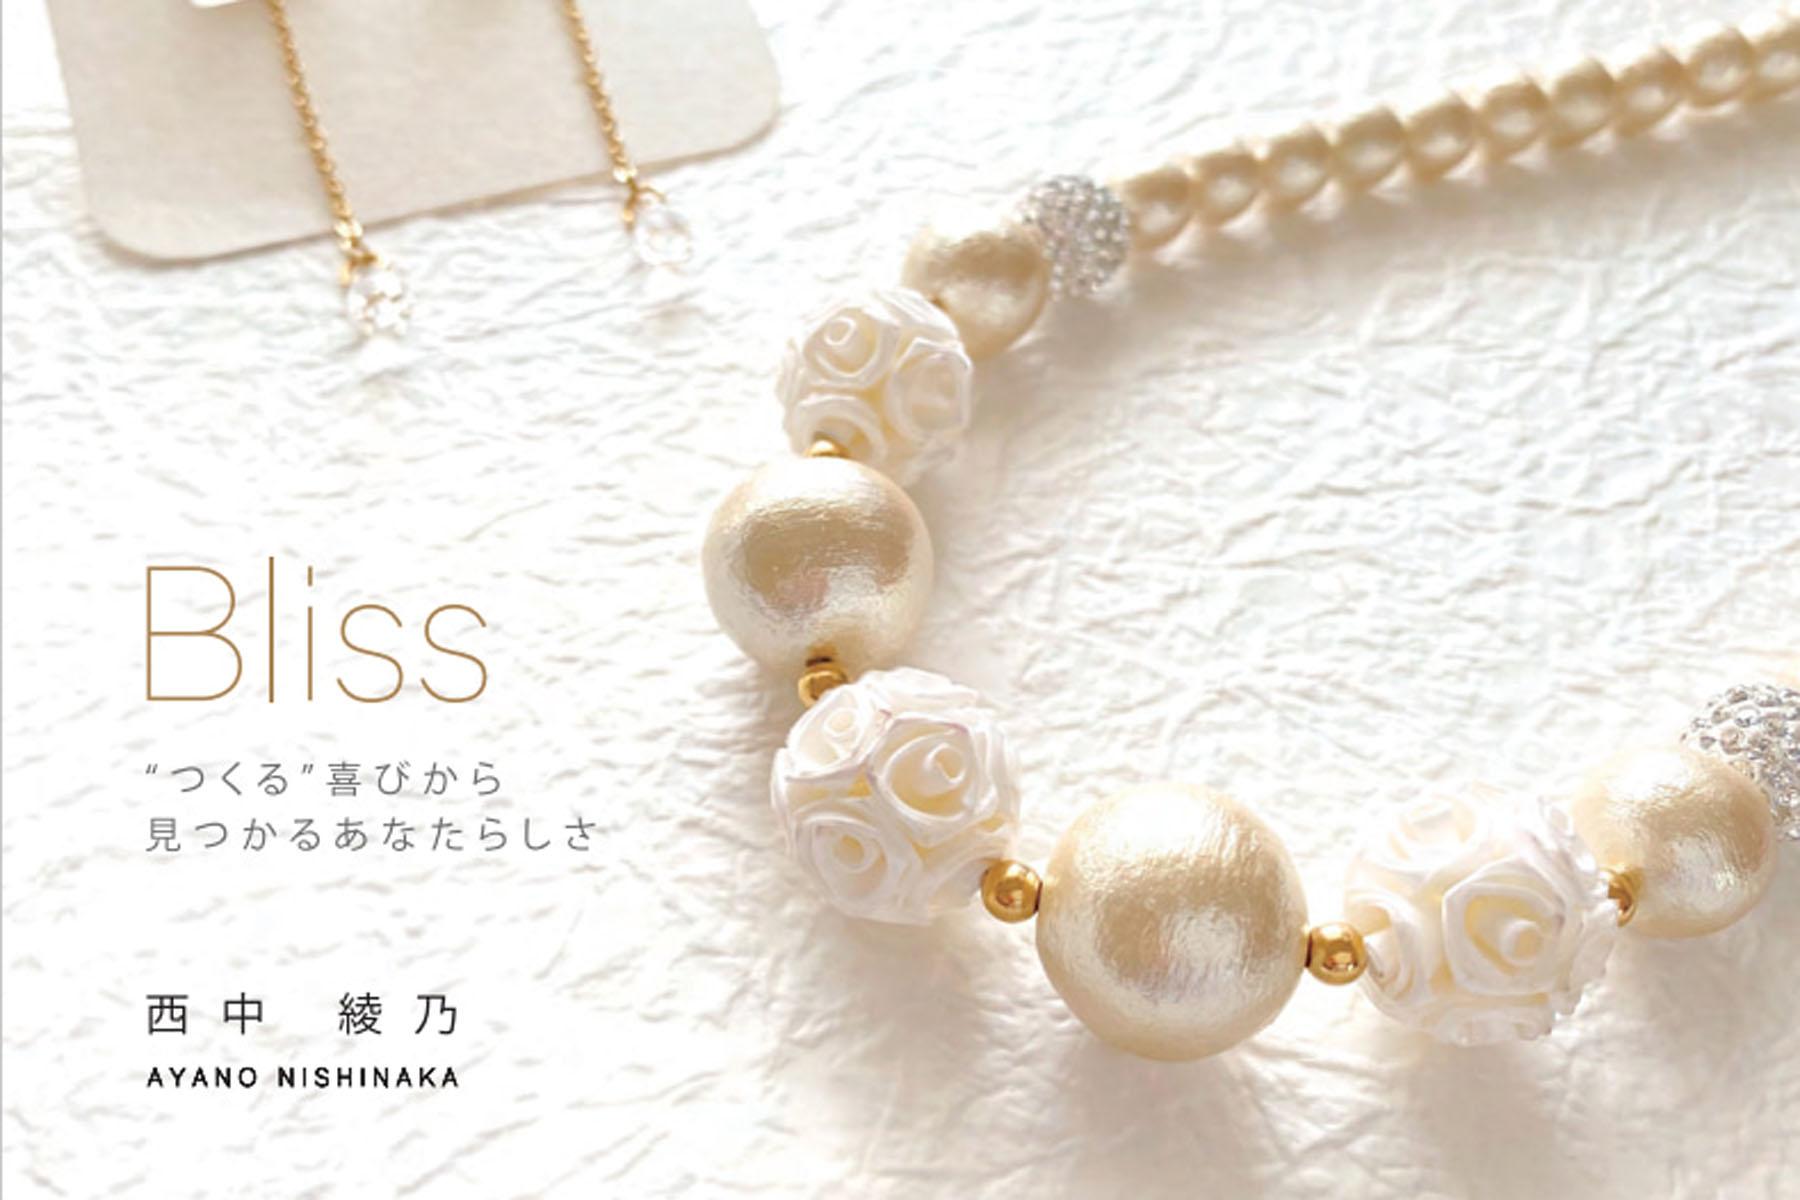 『Bliss